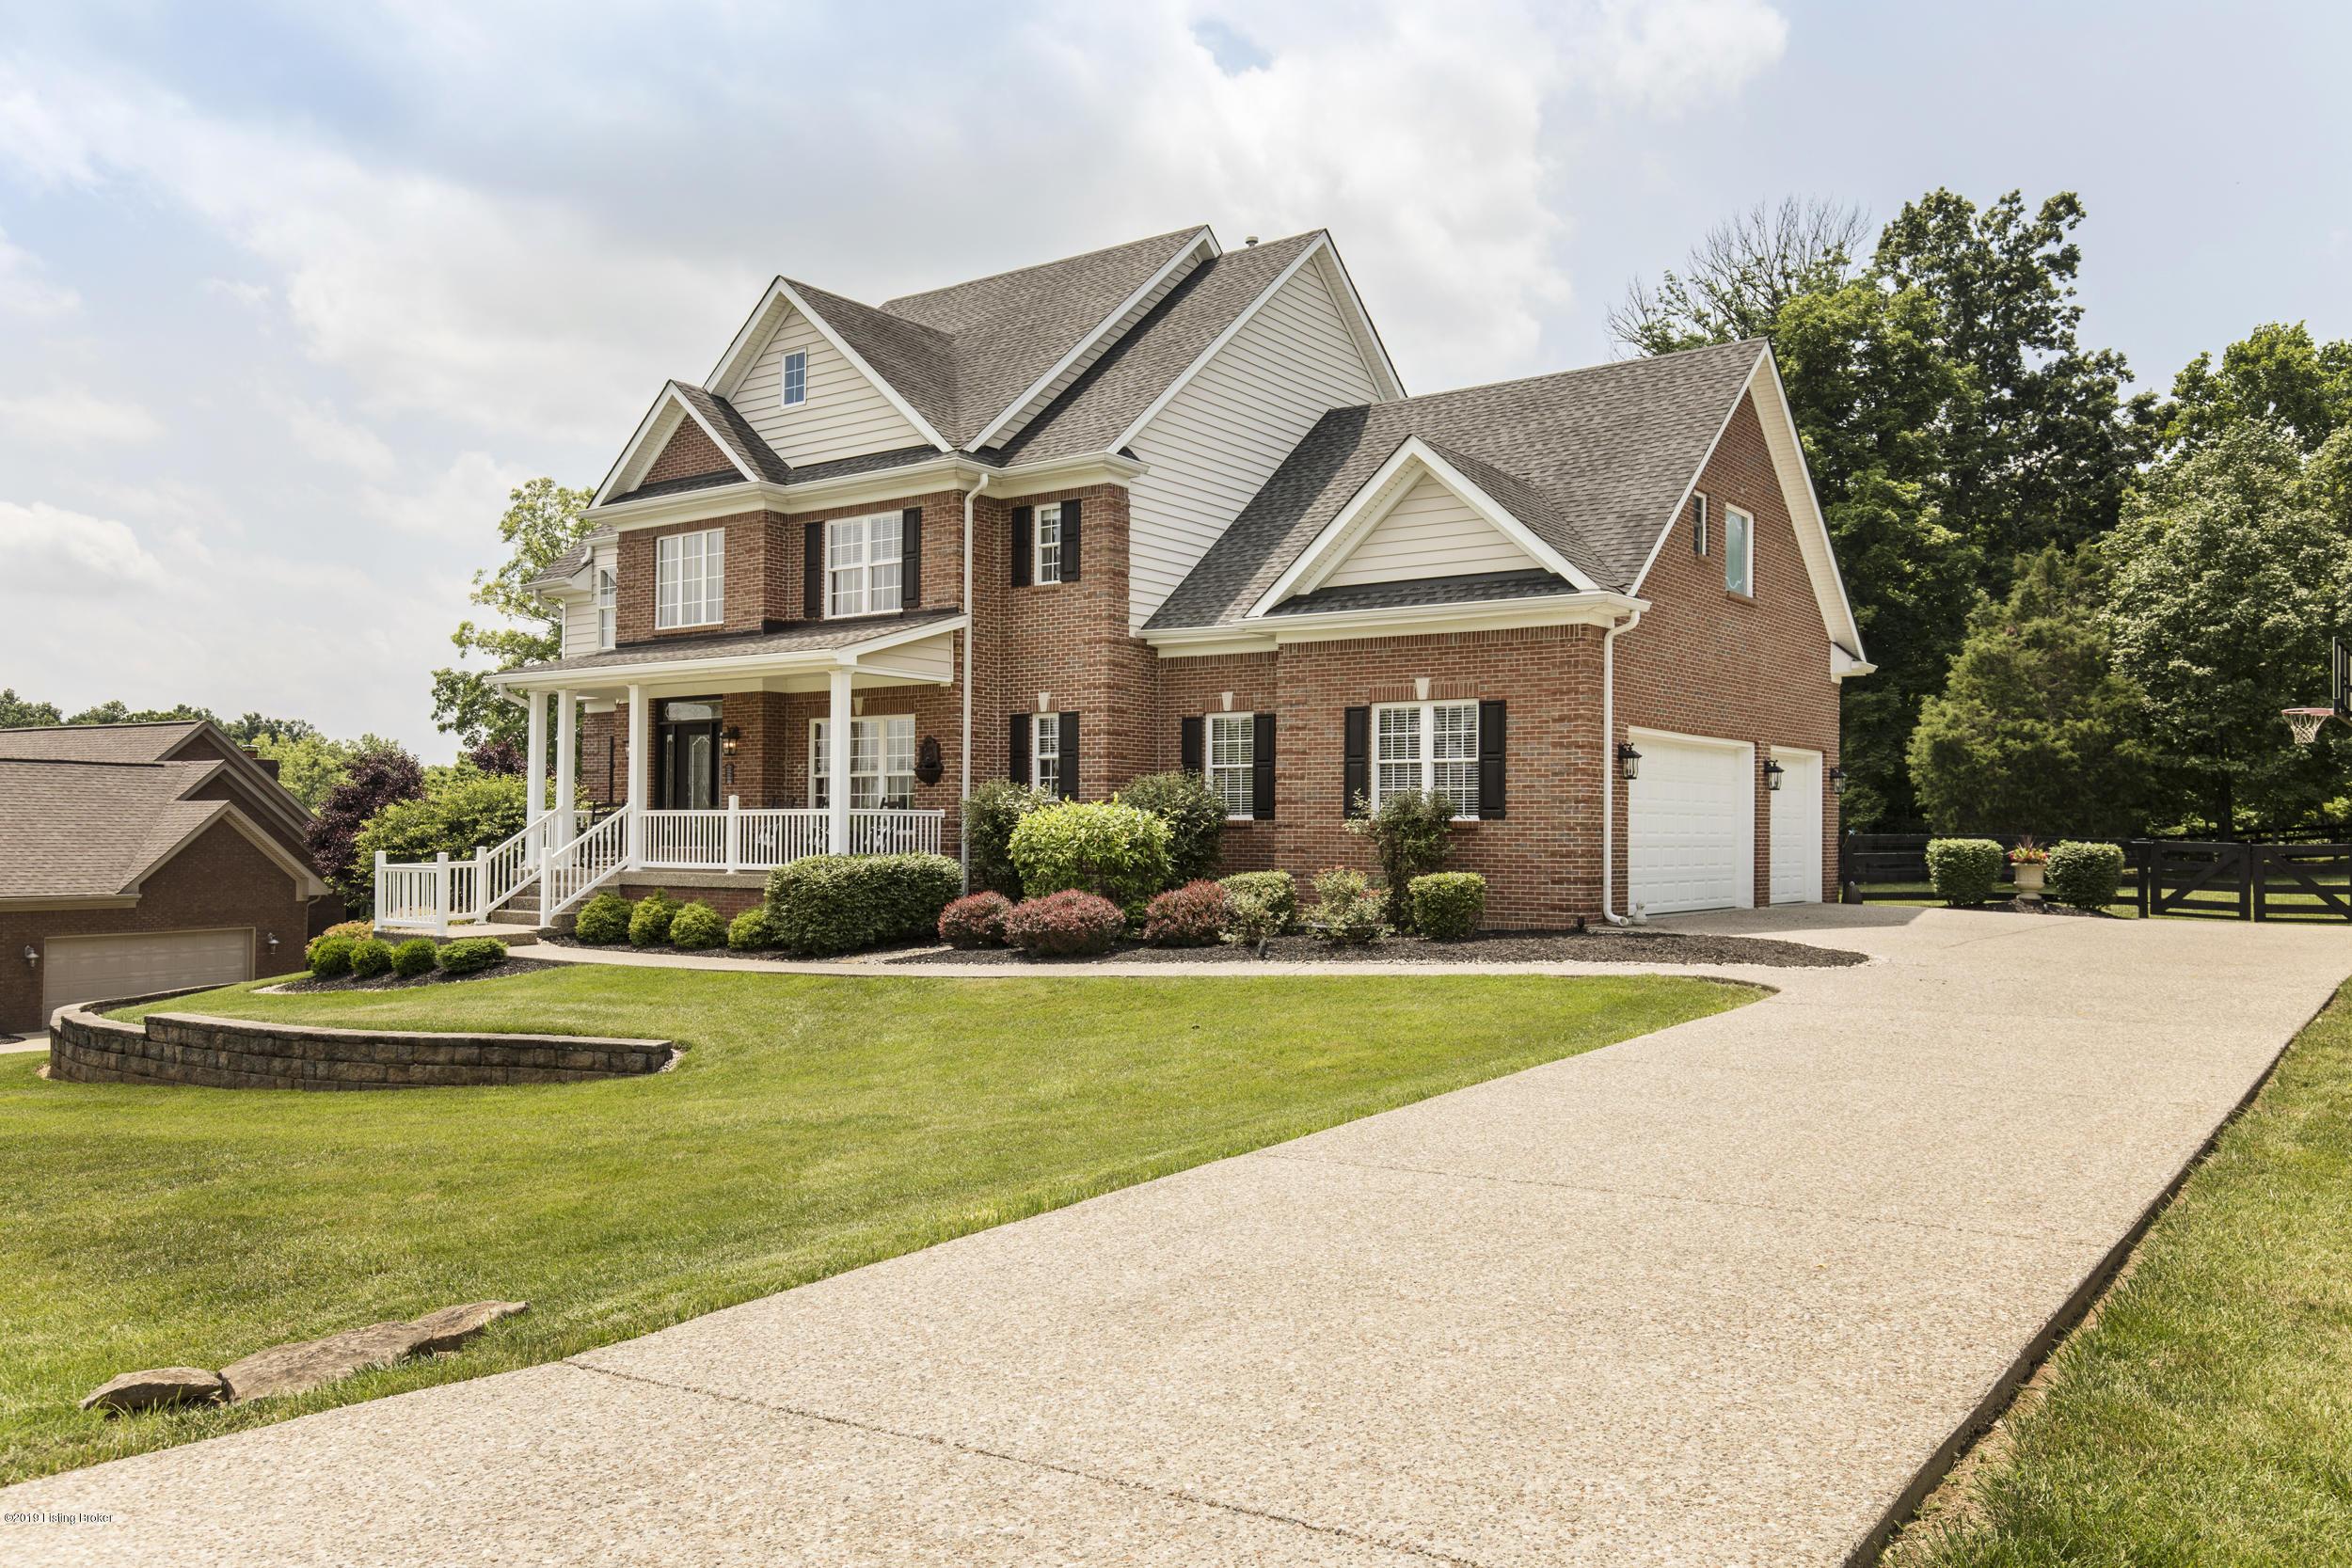 4815 Stanley Farm Ct, La Grange, Kentucky 40031, 6 Bedrooms Bedrooms, 16 Rooms Rooms,5 BathroomsBathrooms,Residential,For Sale,Stanley Farm,1534163